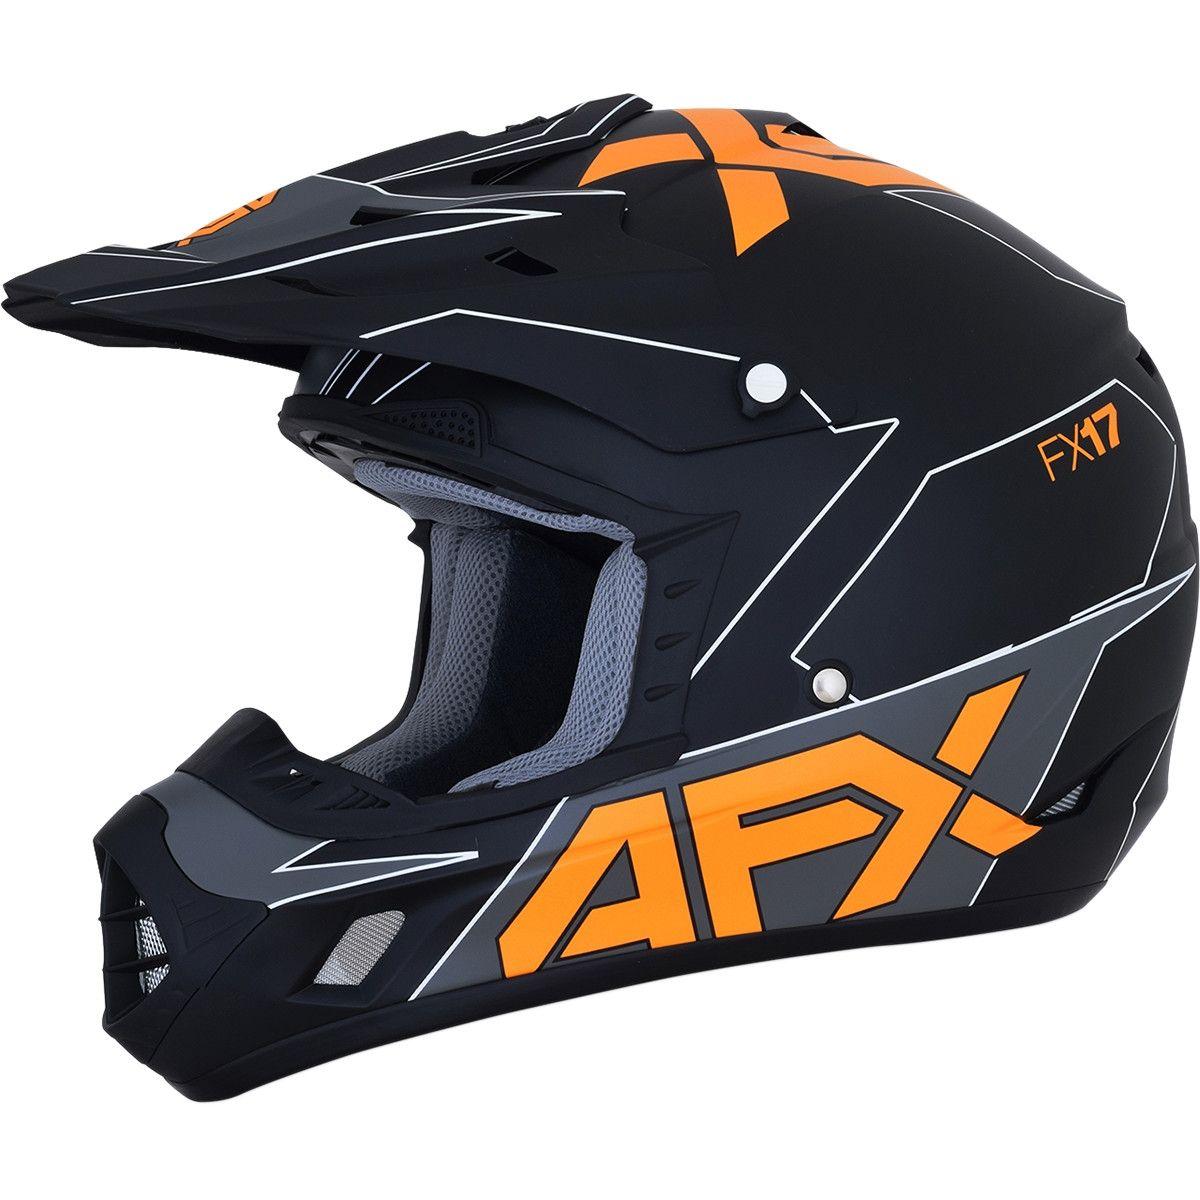 AFX Crosshelm FX-17 Matte Black/Orange